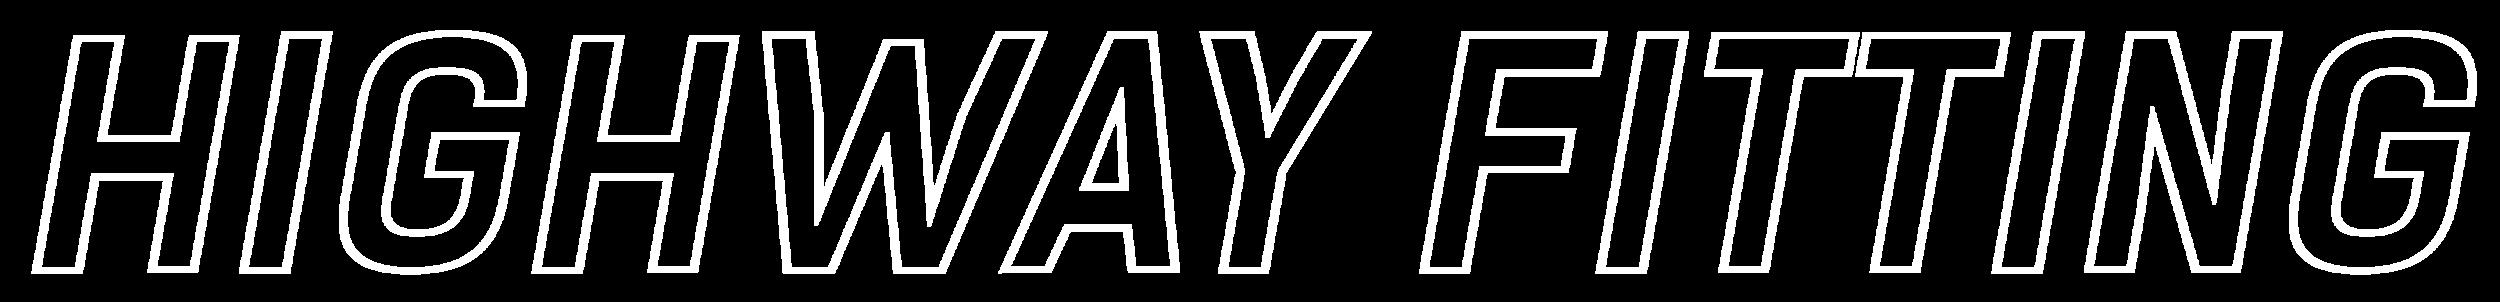 HighwayFittingTitle-02-01.png